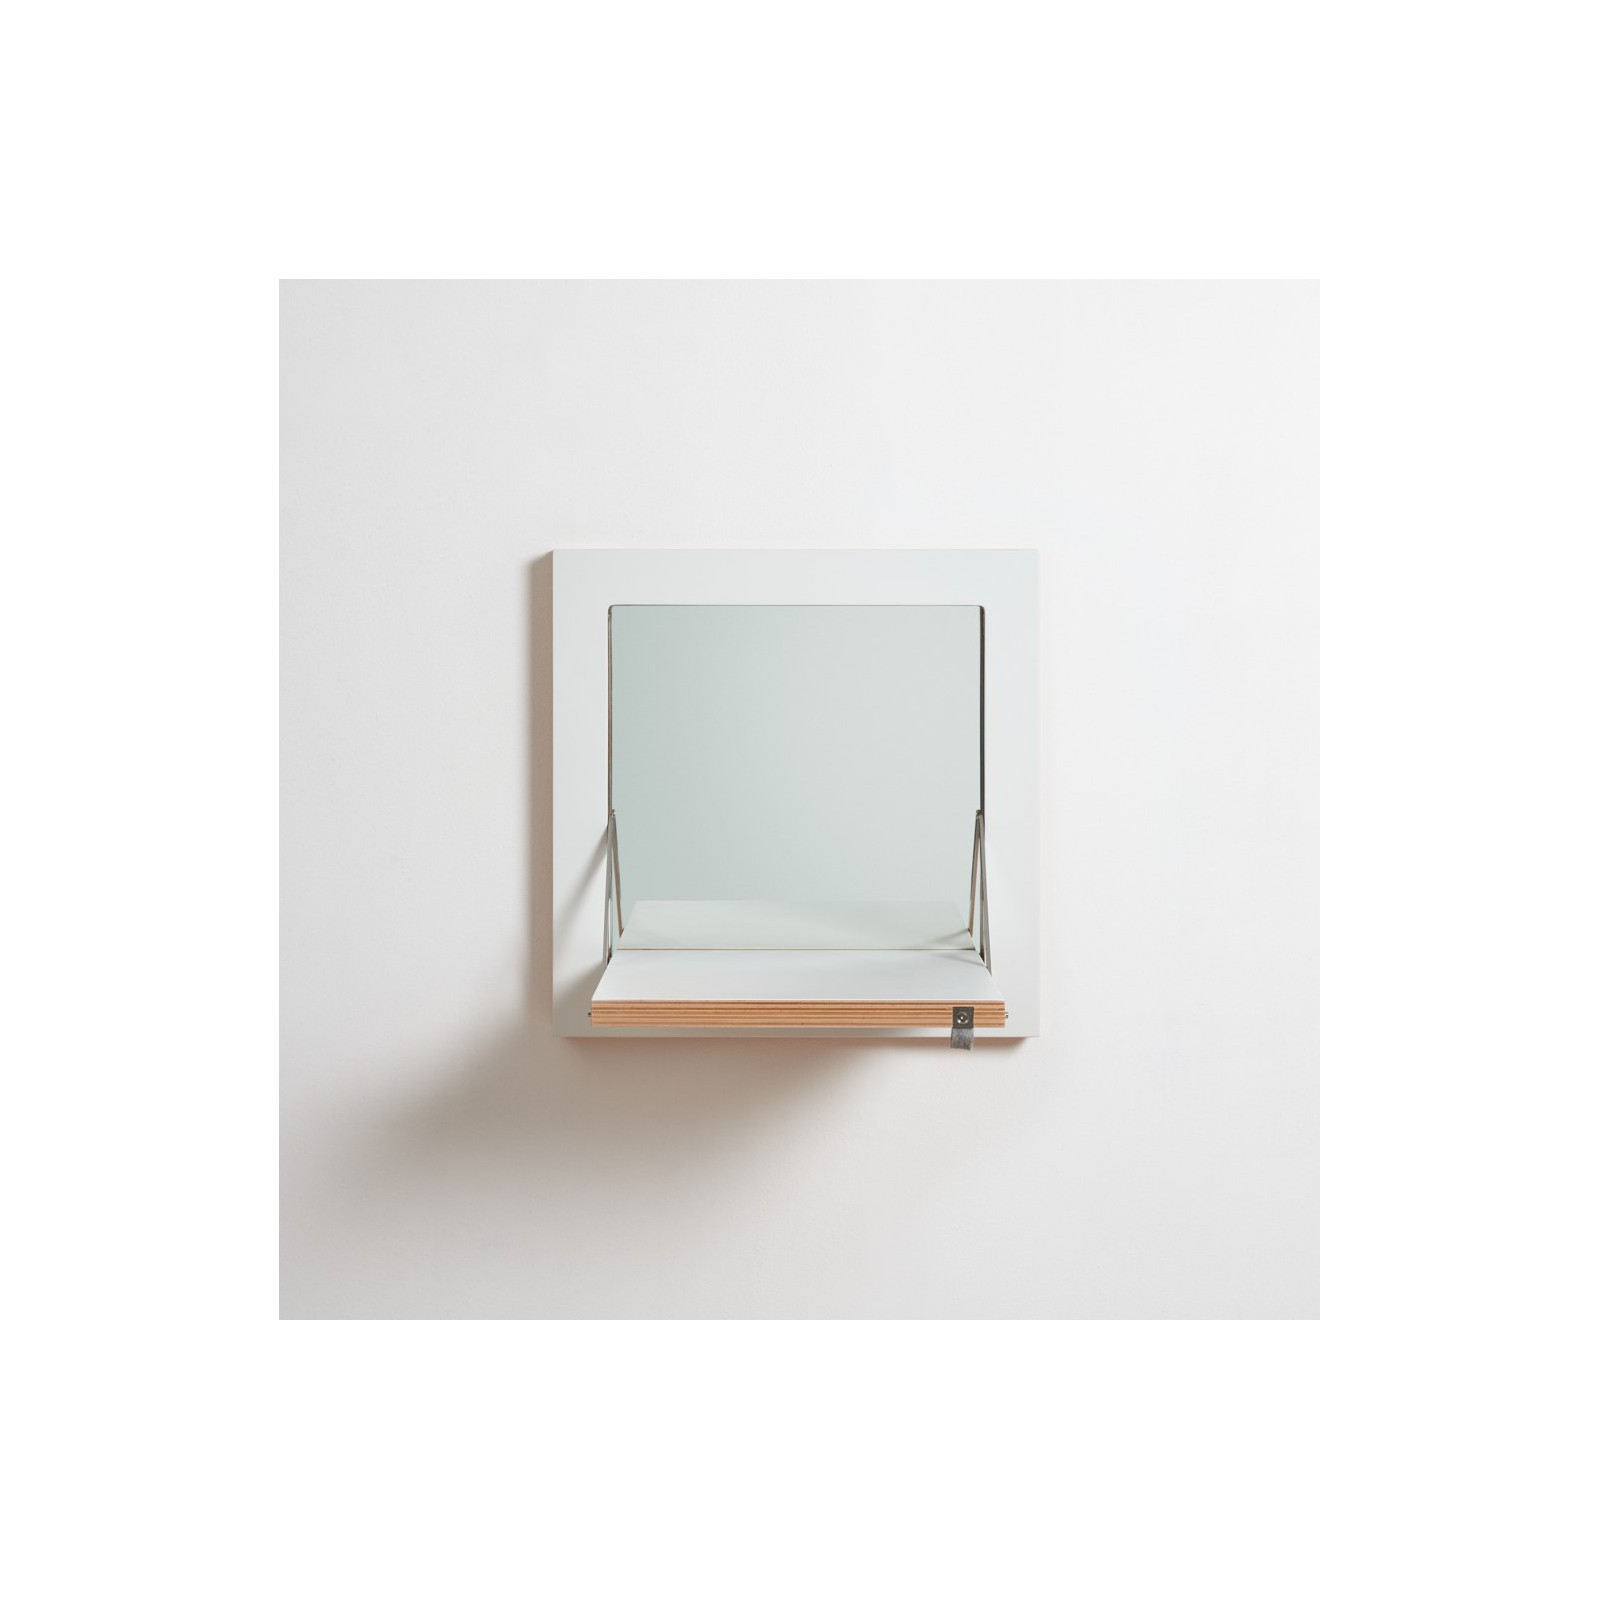 Miroir feuille blanche arne concept - Ecrire en miroir ...